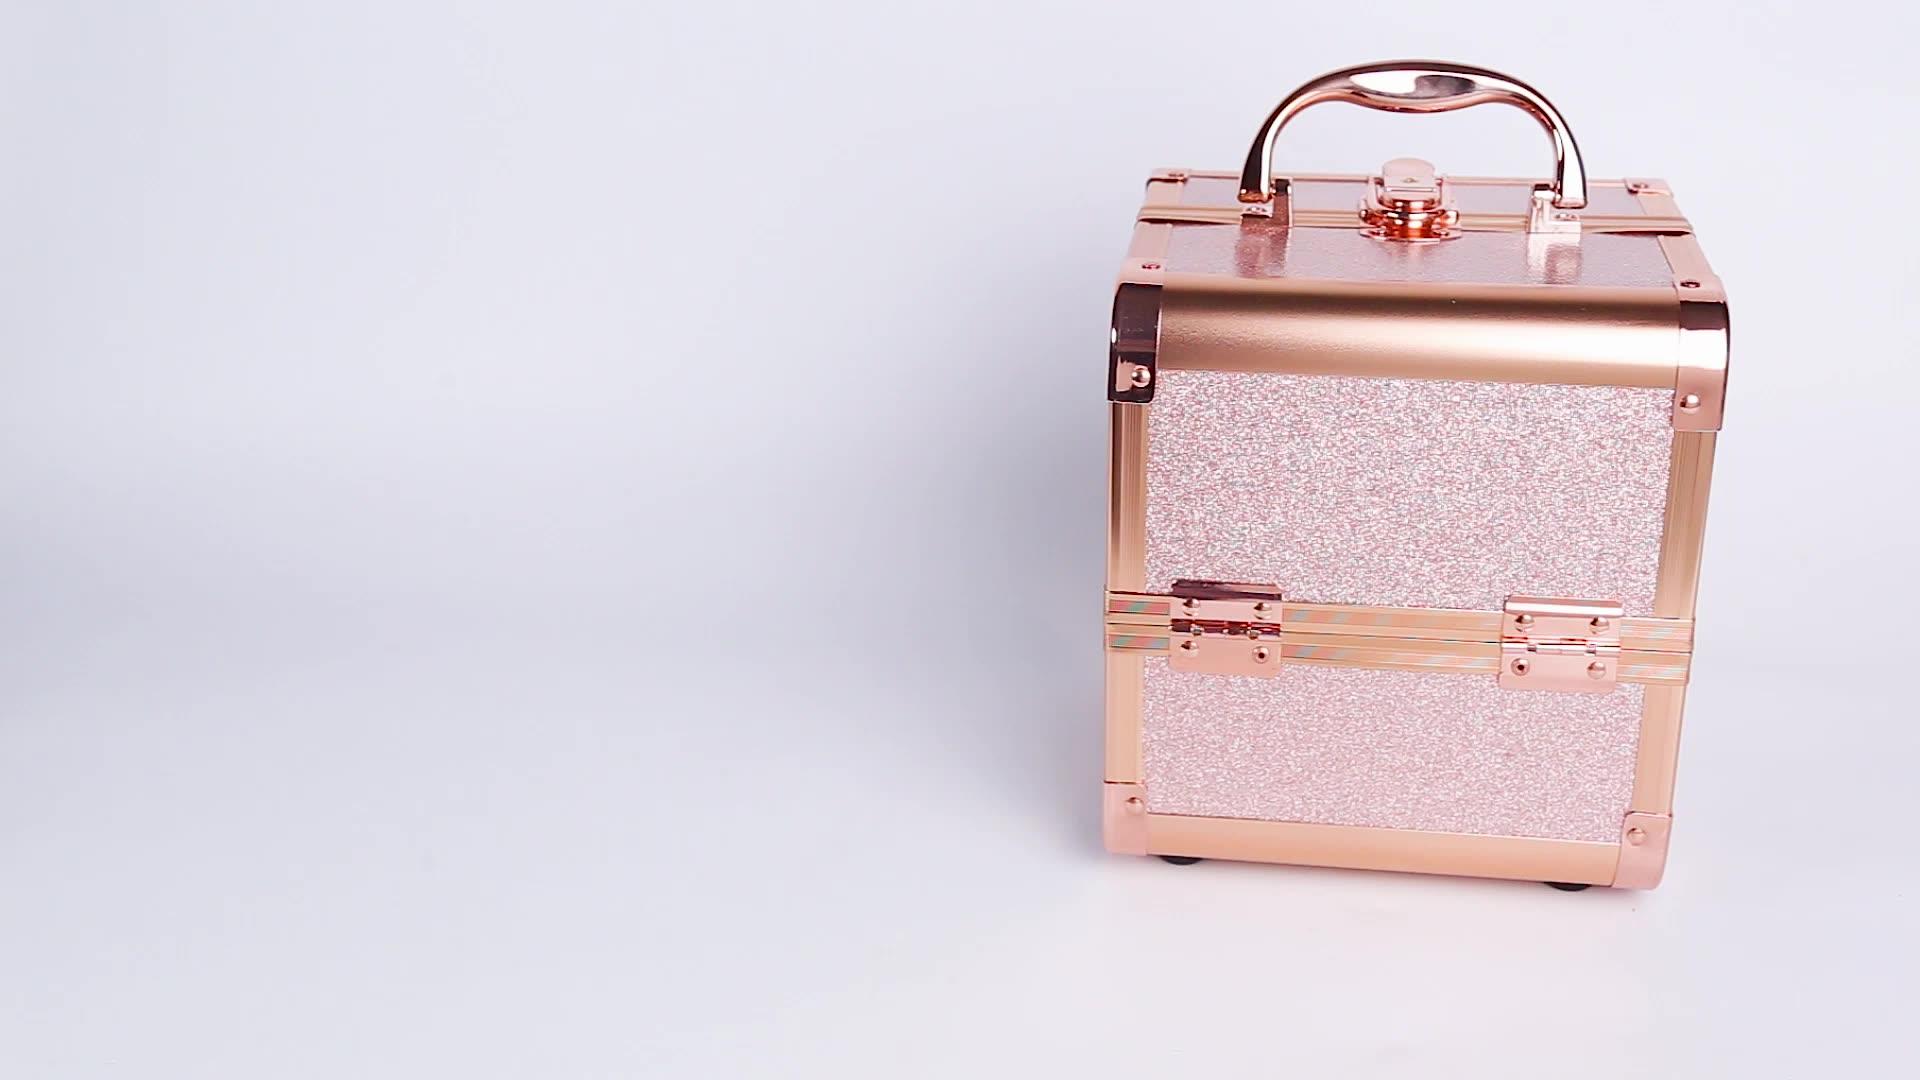 Keyson alluminio box cosmetic makeup artist train kit caso